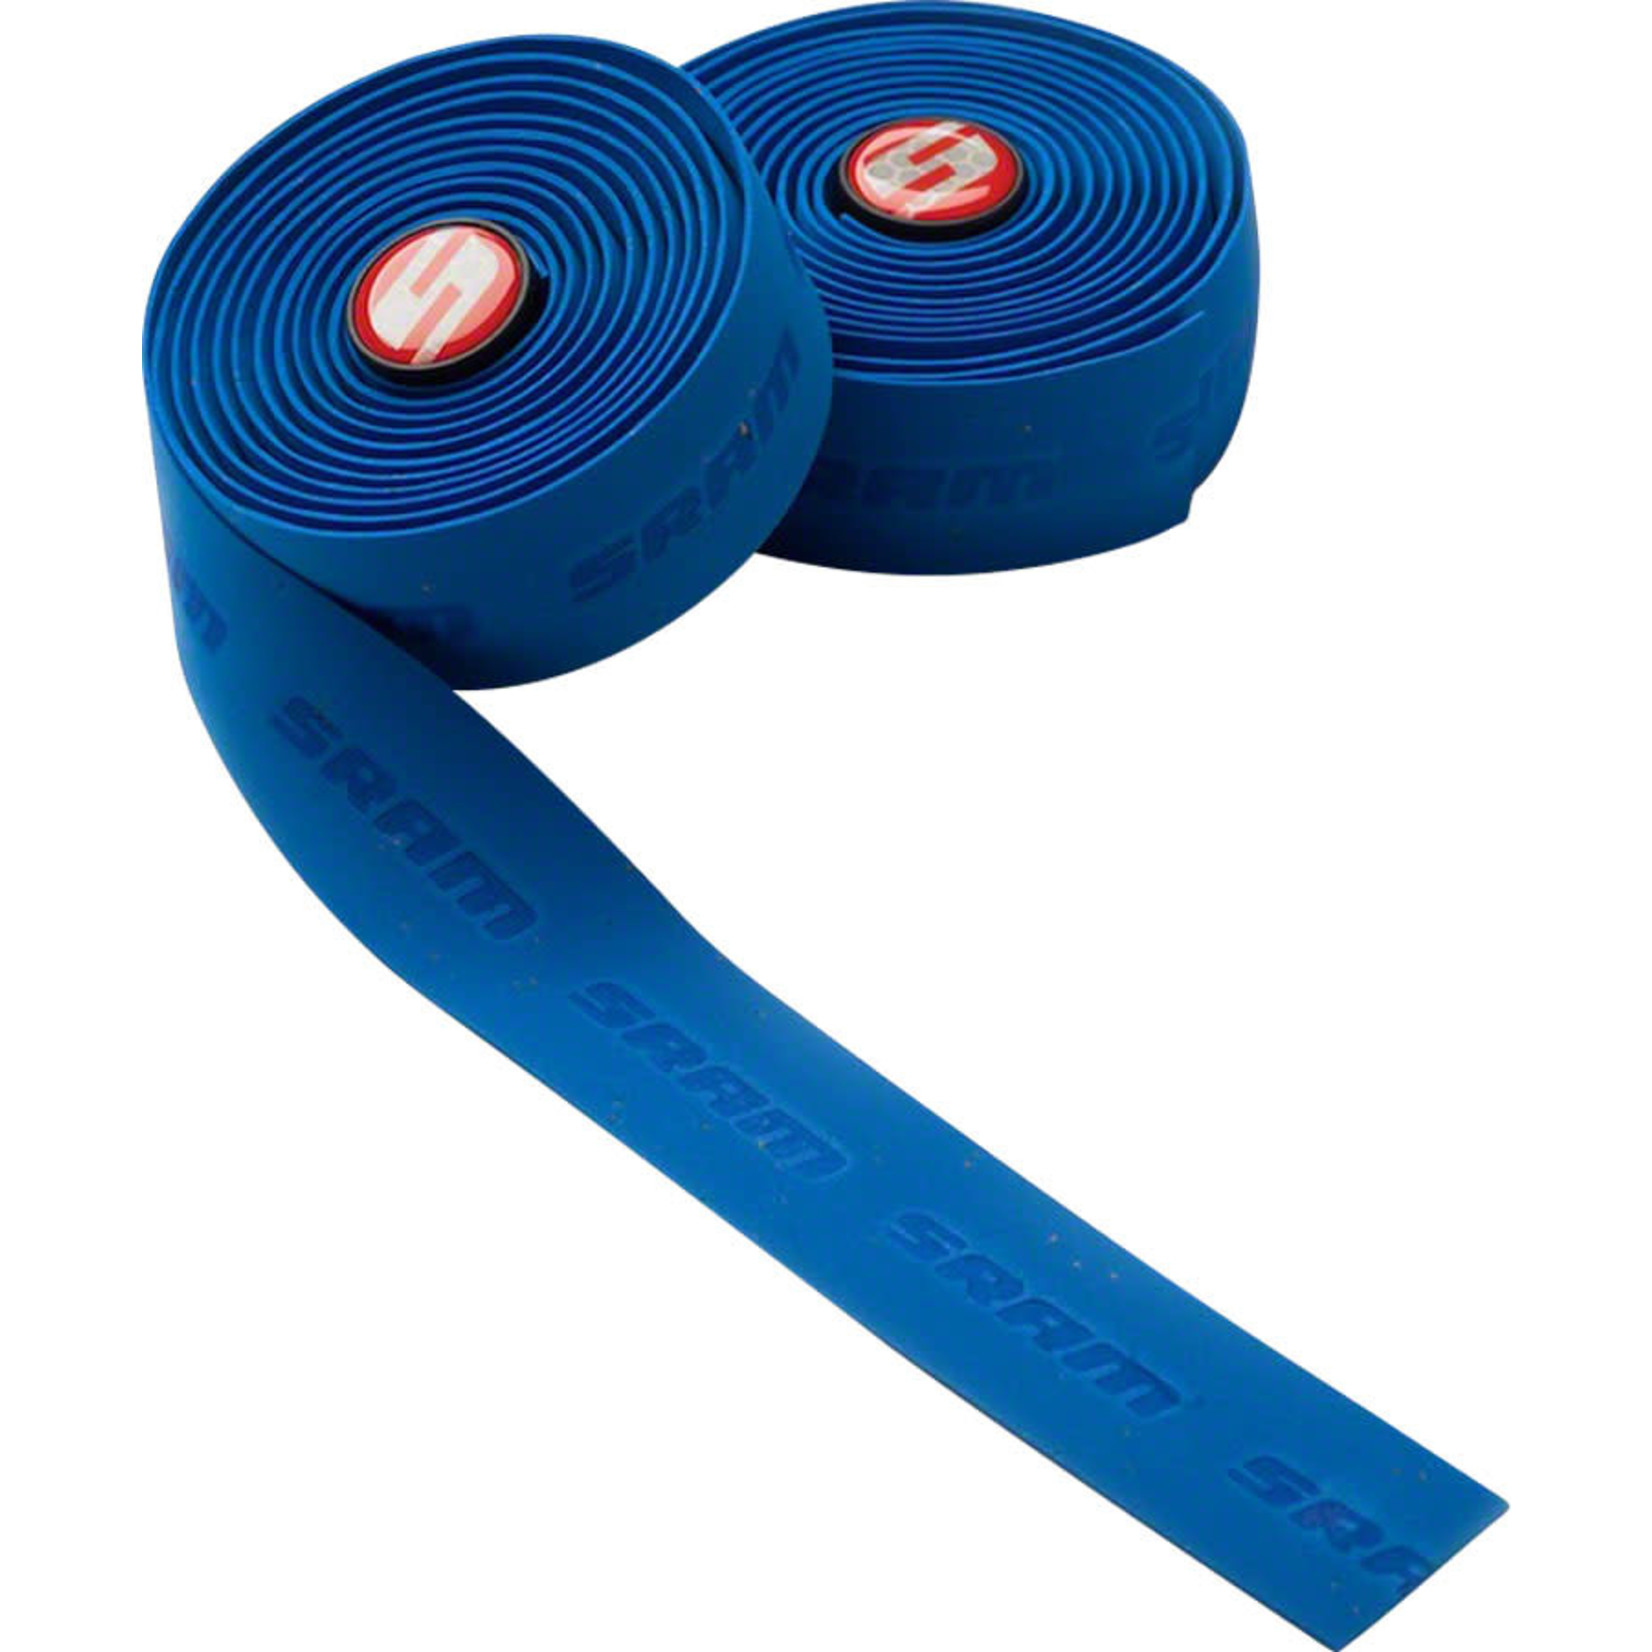 SRAM SRAM SuperCork Handlebar Tape - Blue